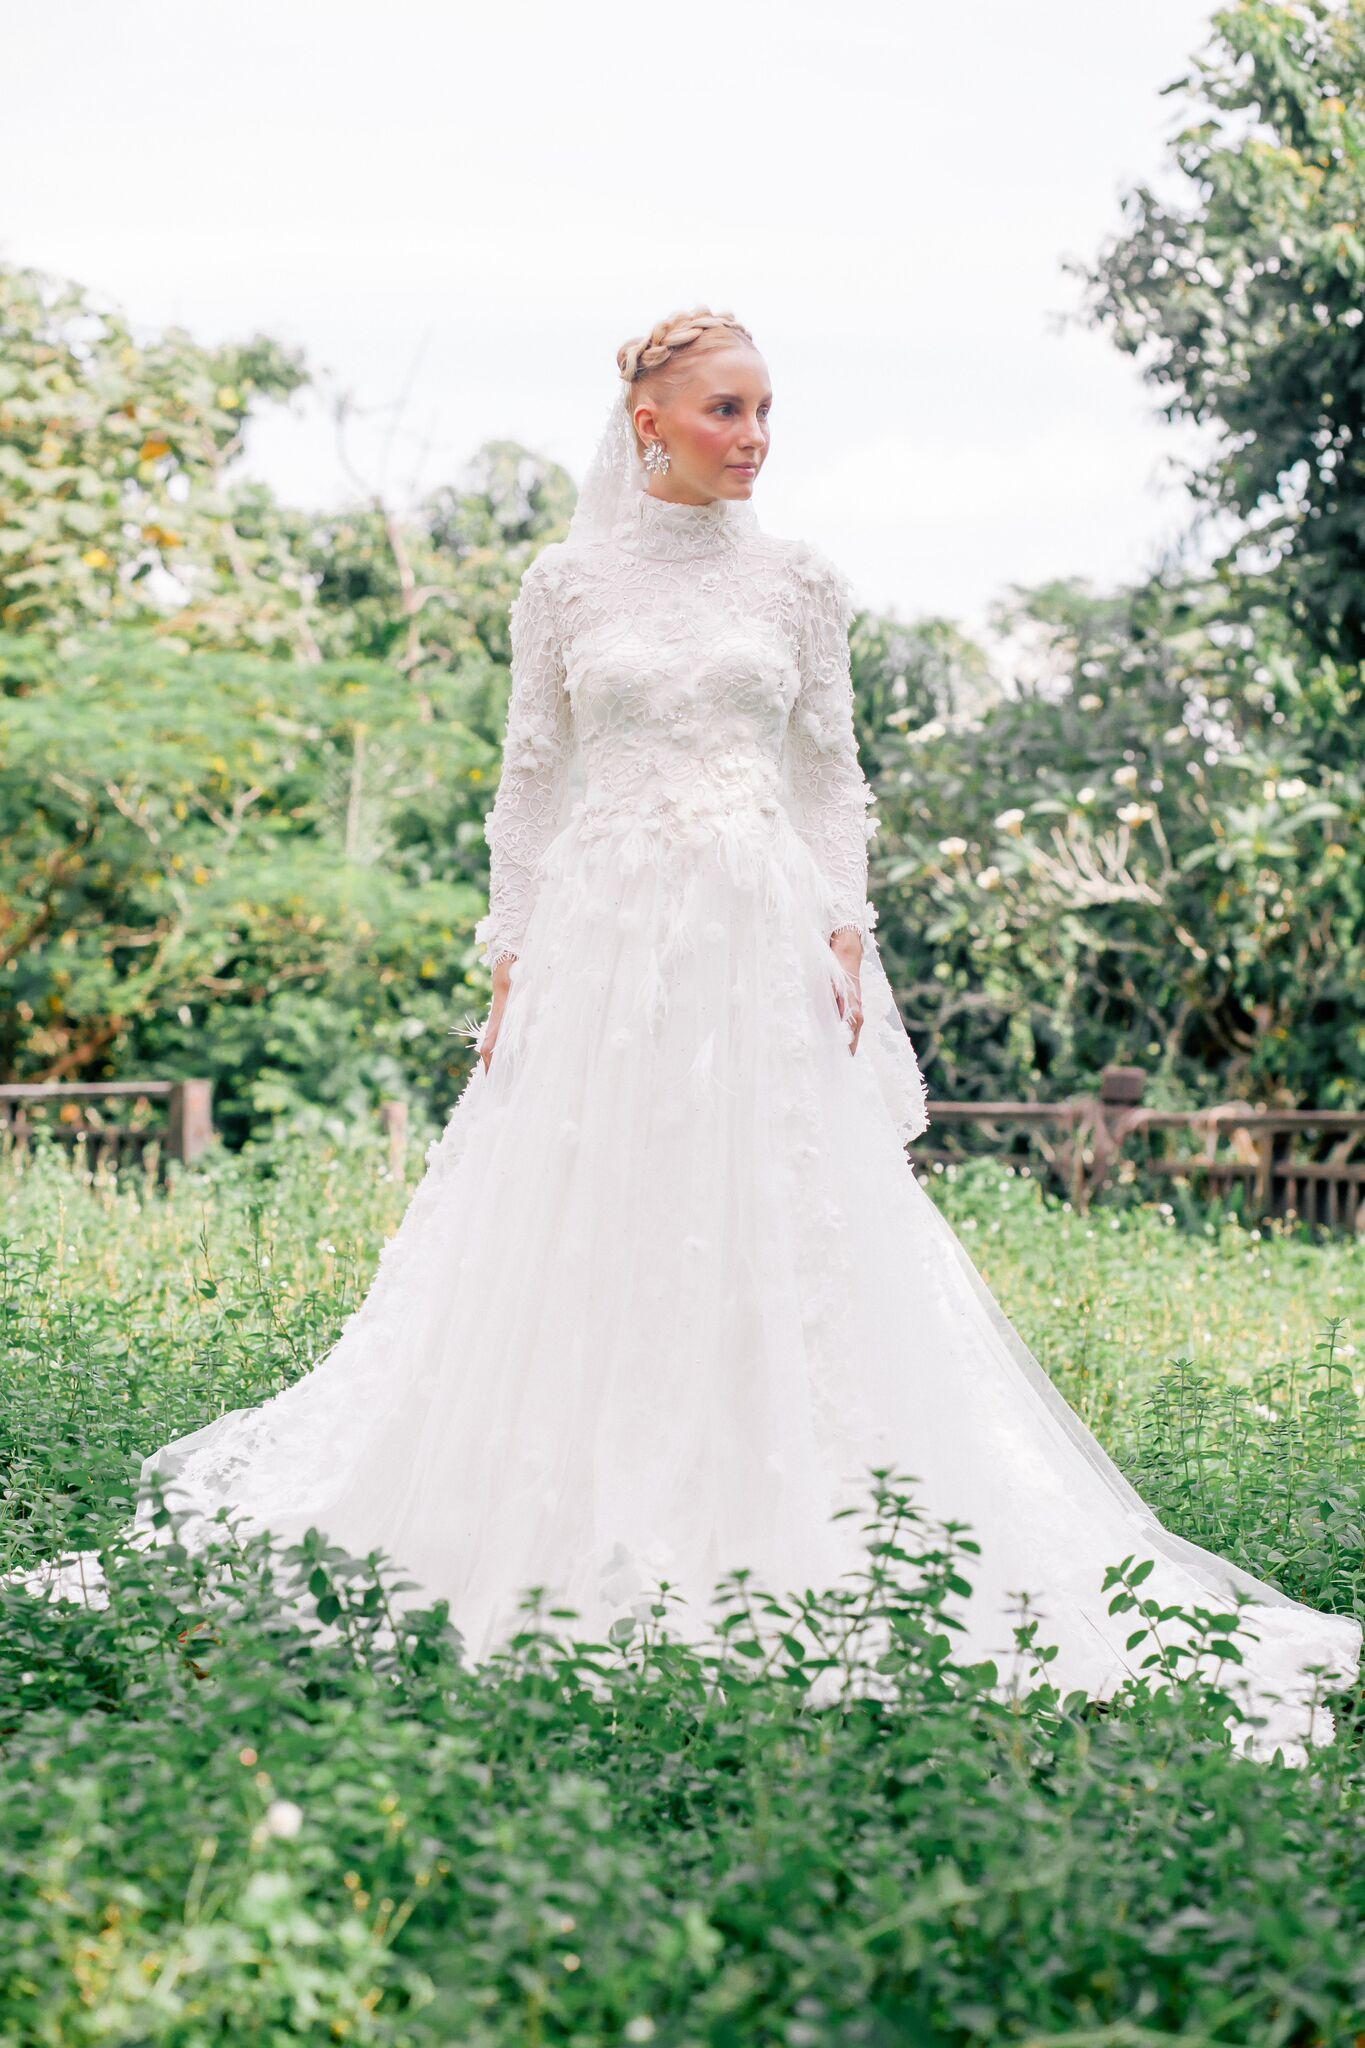 page 2 - model white dress.jpg